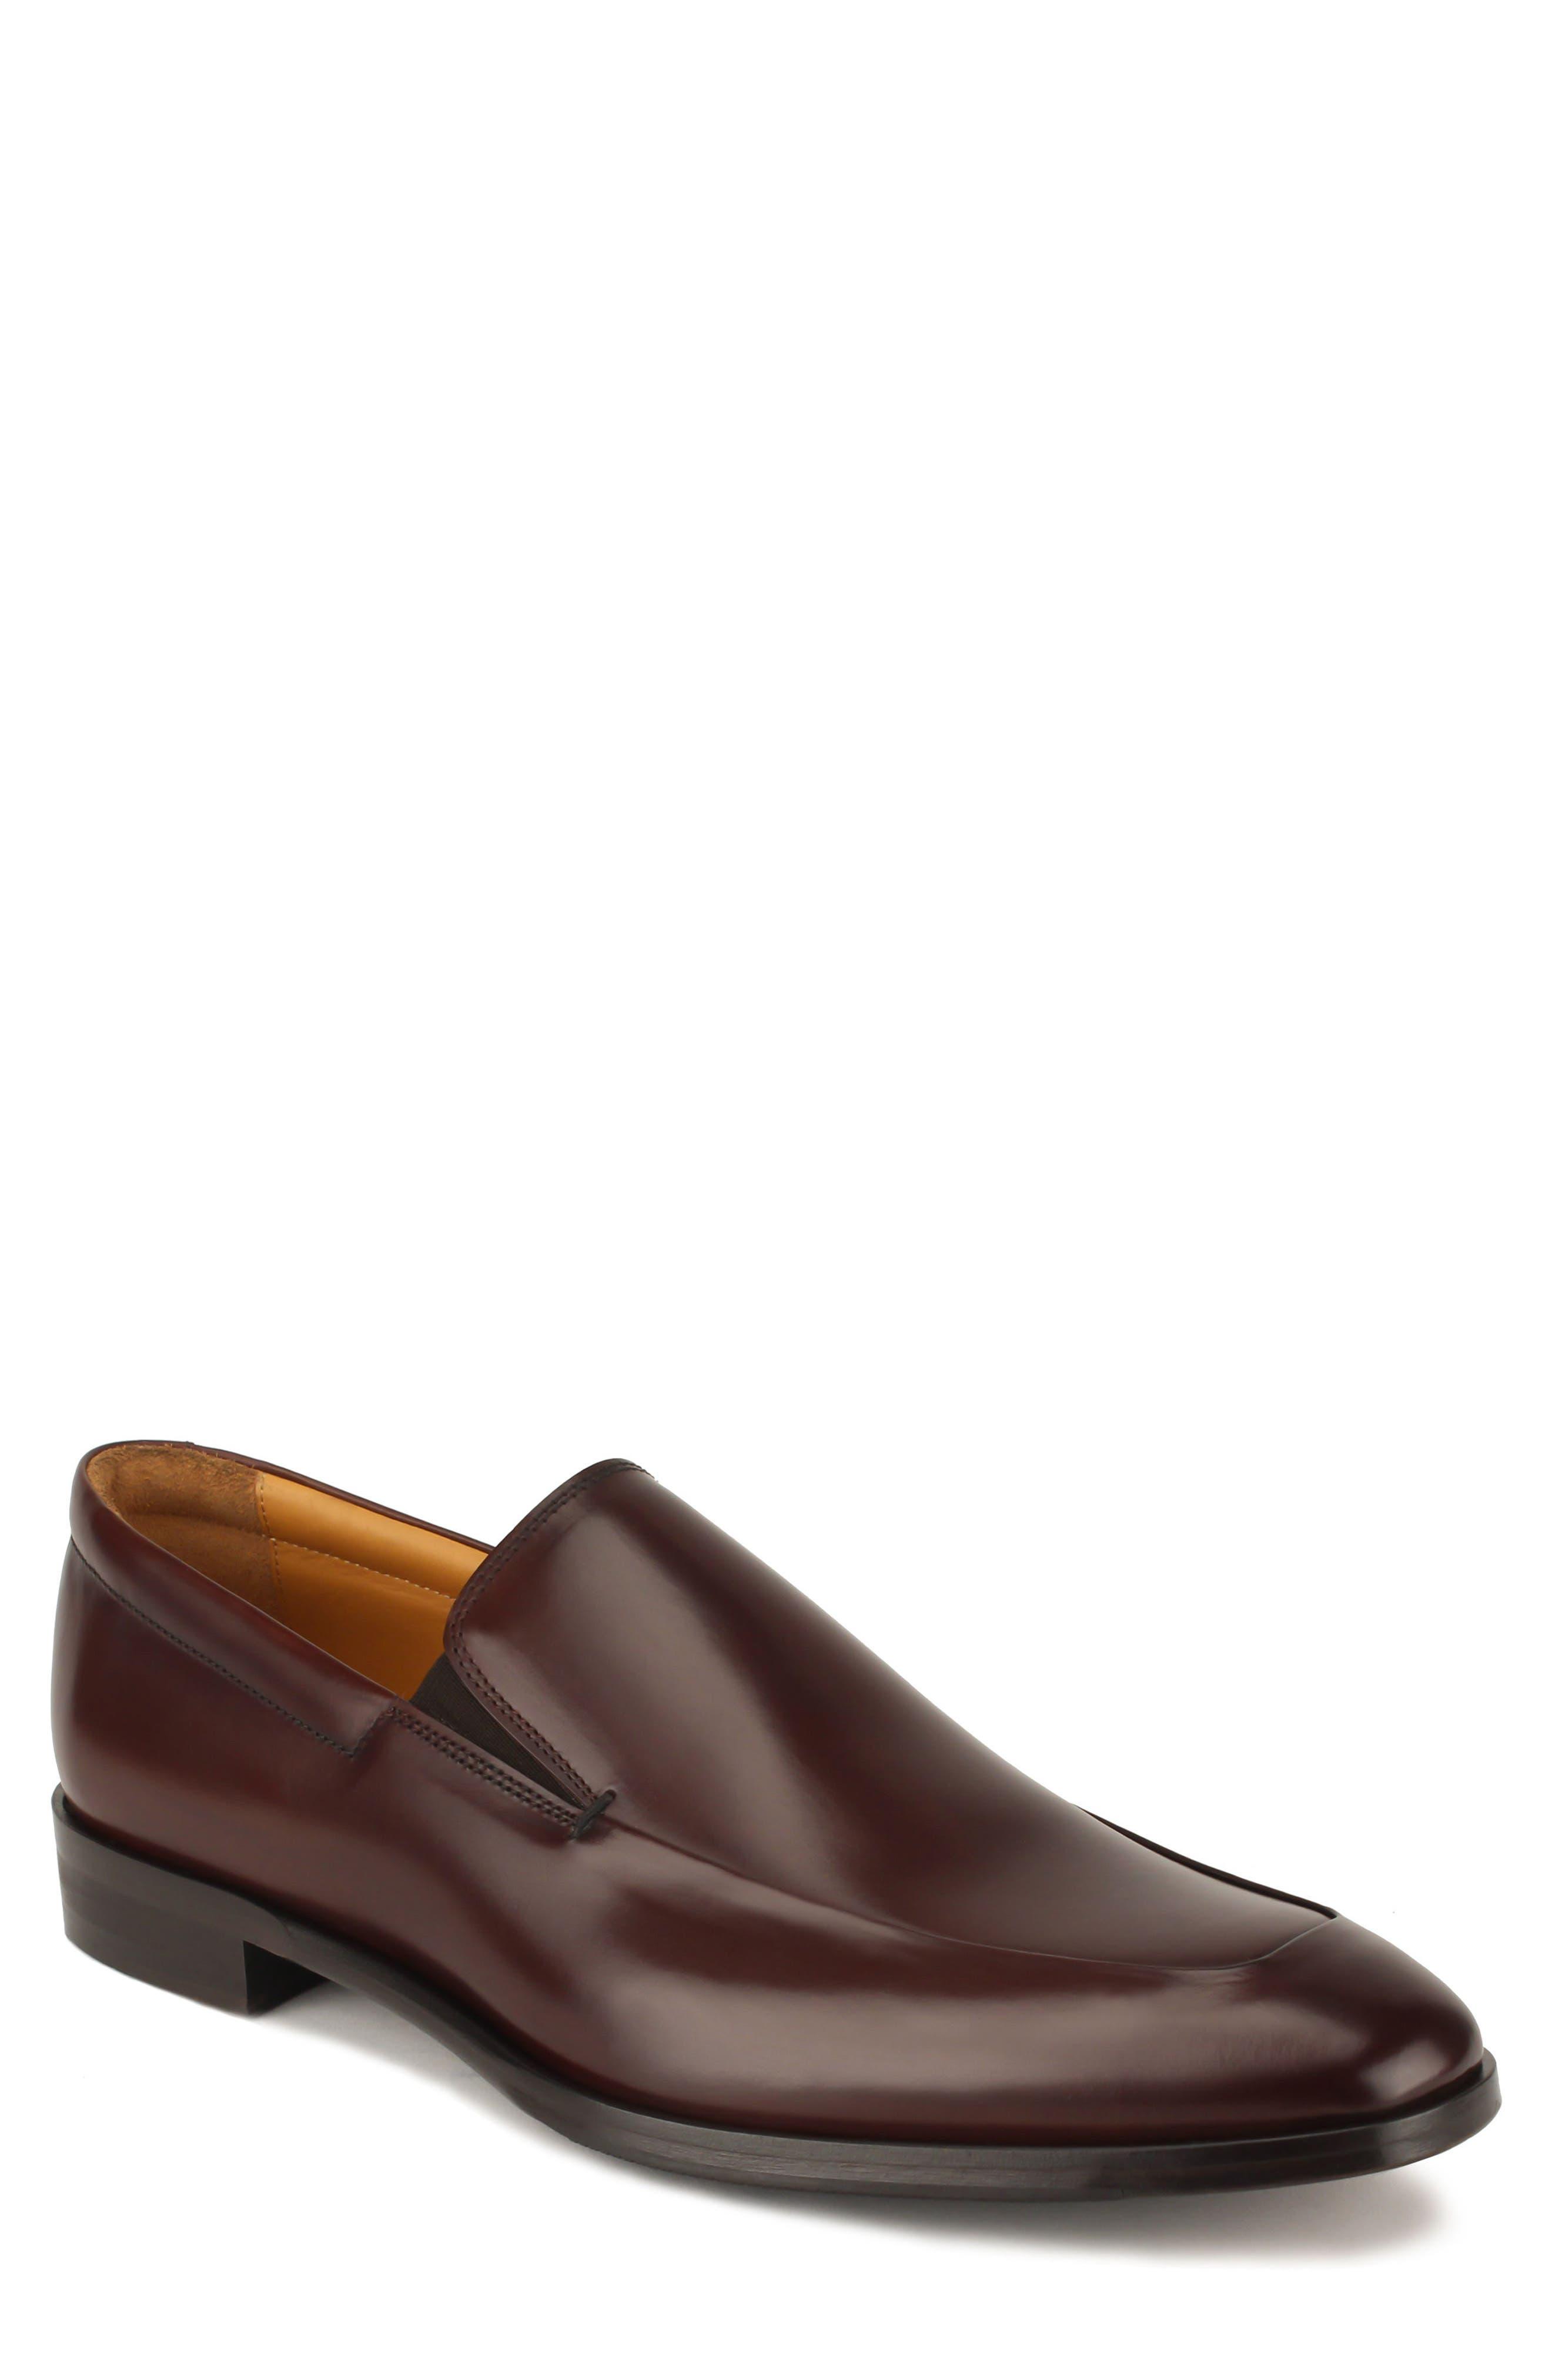 Brighton II Venetian Loafer,                             Main thumbnail 1, color,                             Bourbon Leather